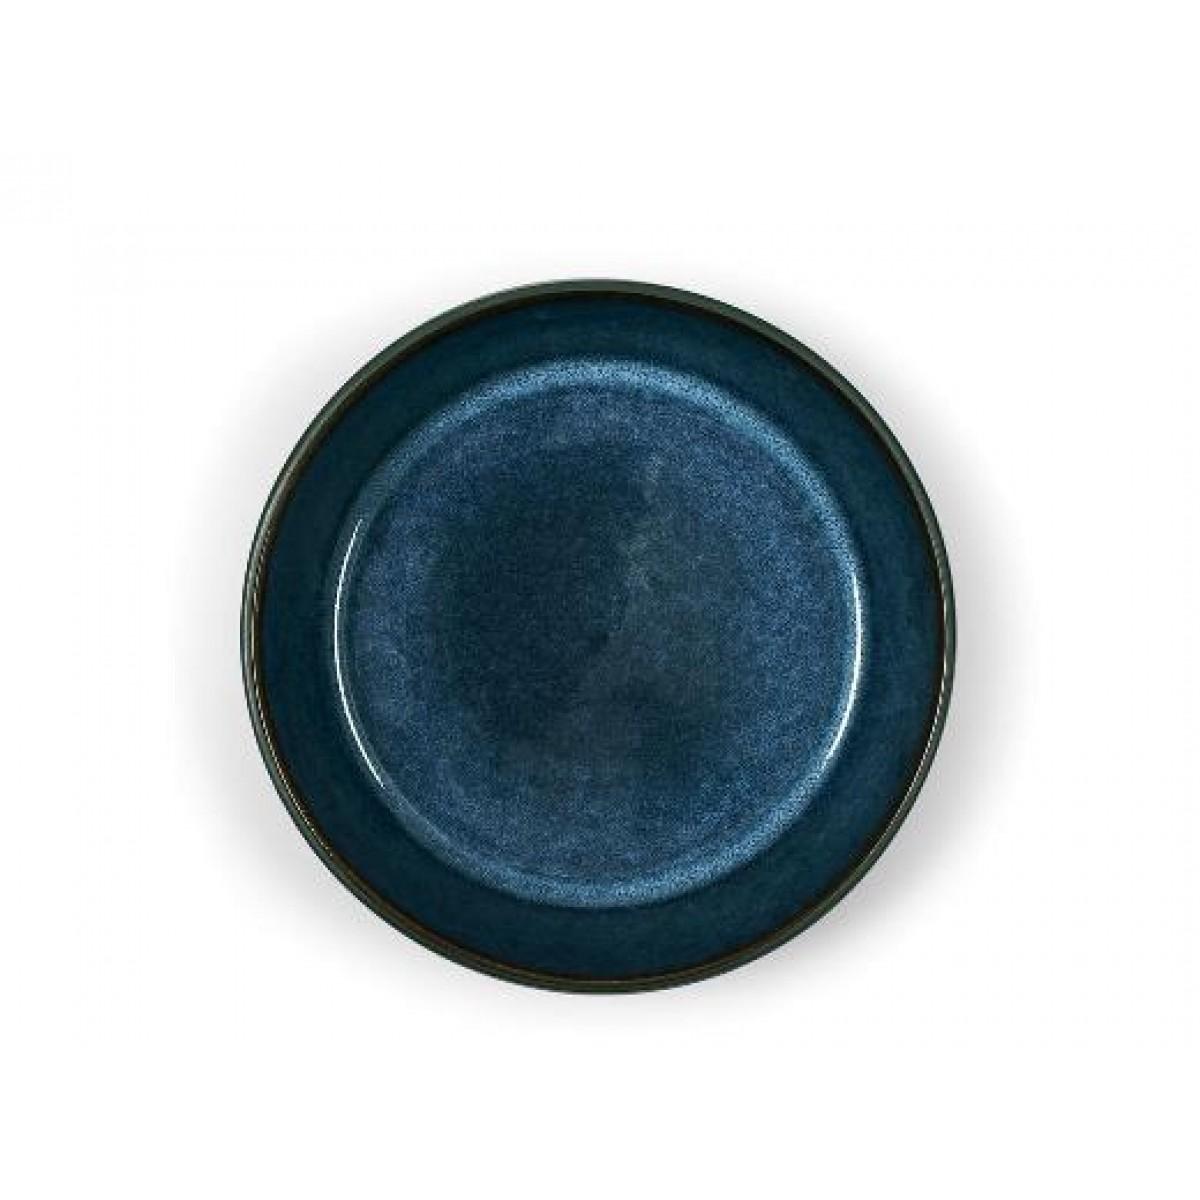 BITZ Suppeskål gastro 18 cm sort/blå